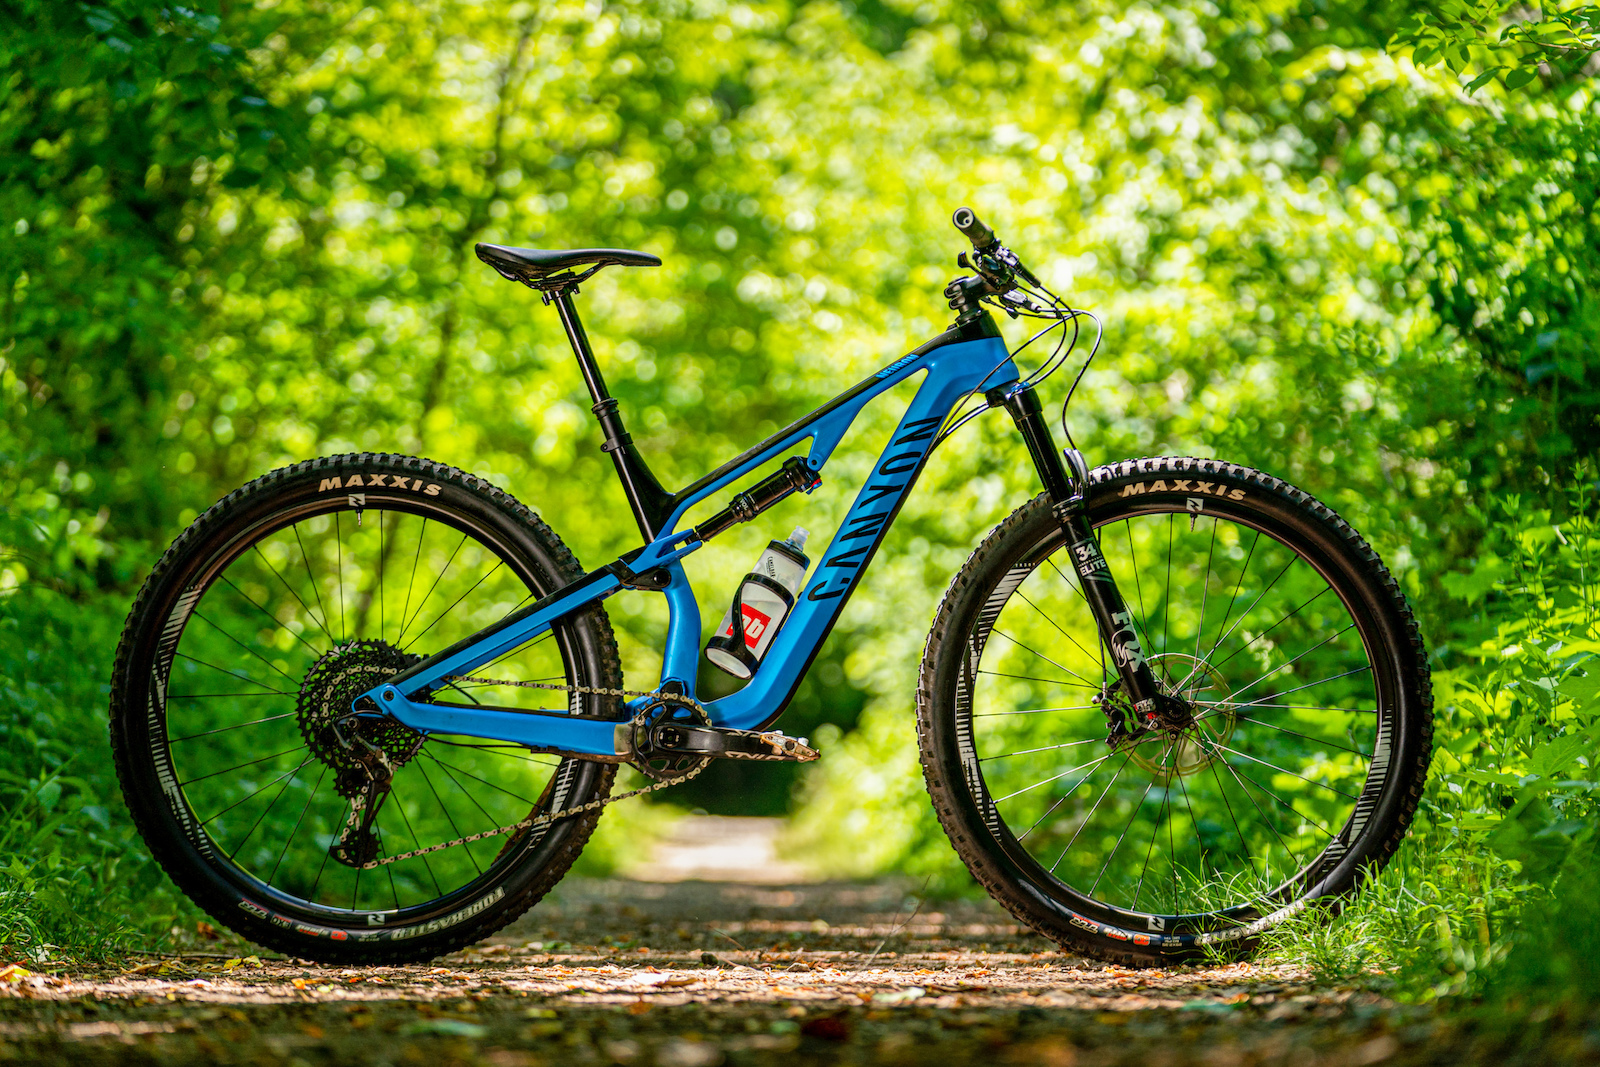 Daniel Sapp mountain bikes in Pisgah National Forest.